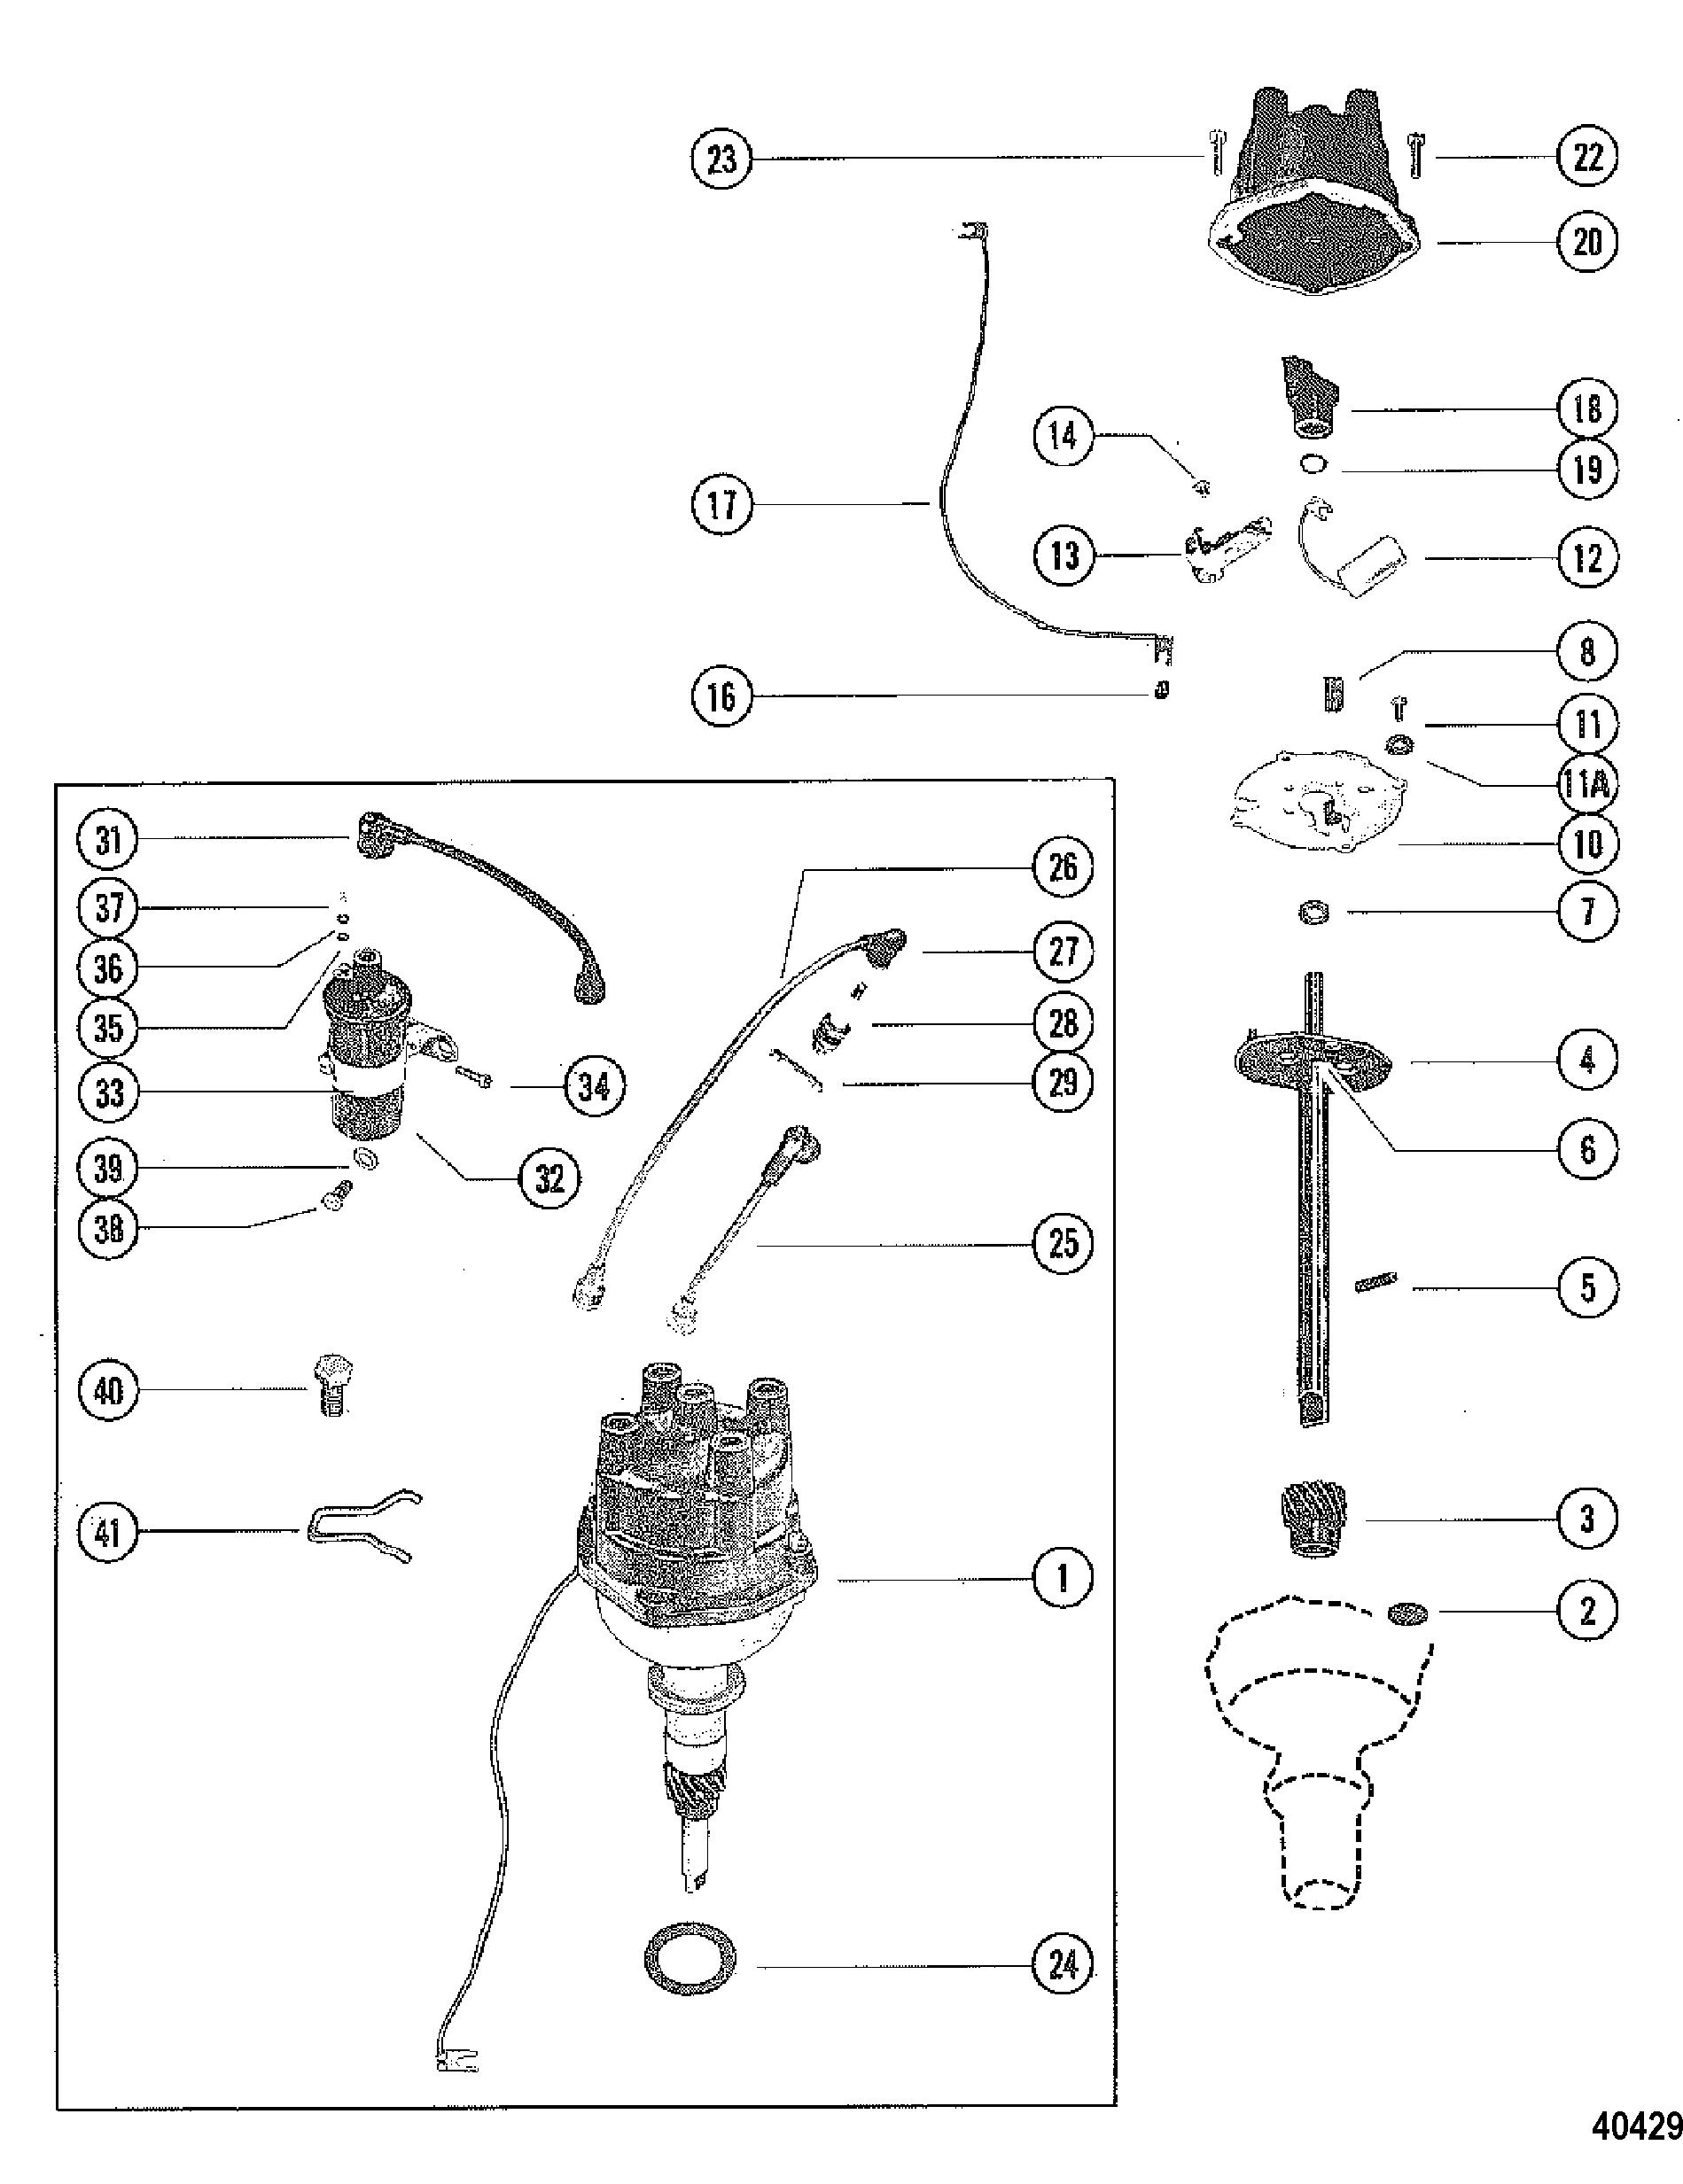 120 mercruiser engine bedradings schema